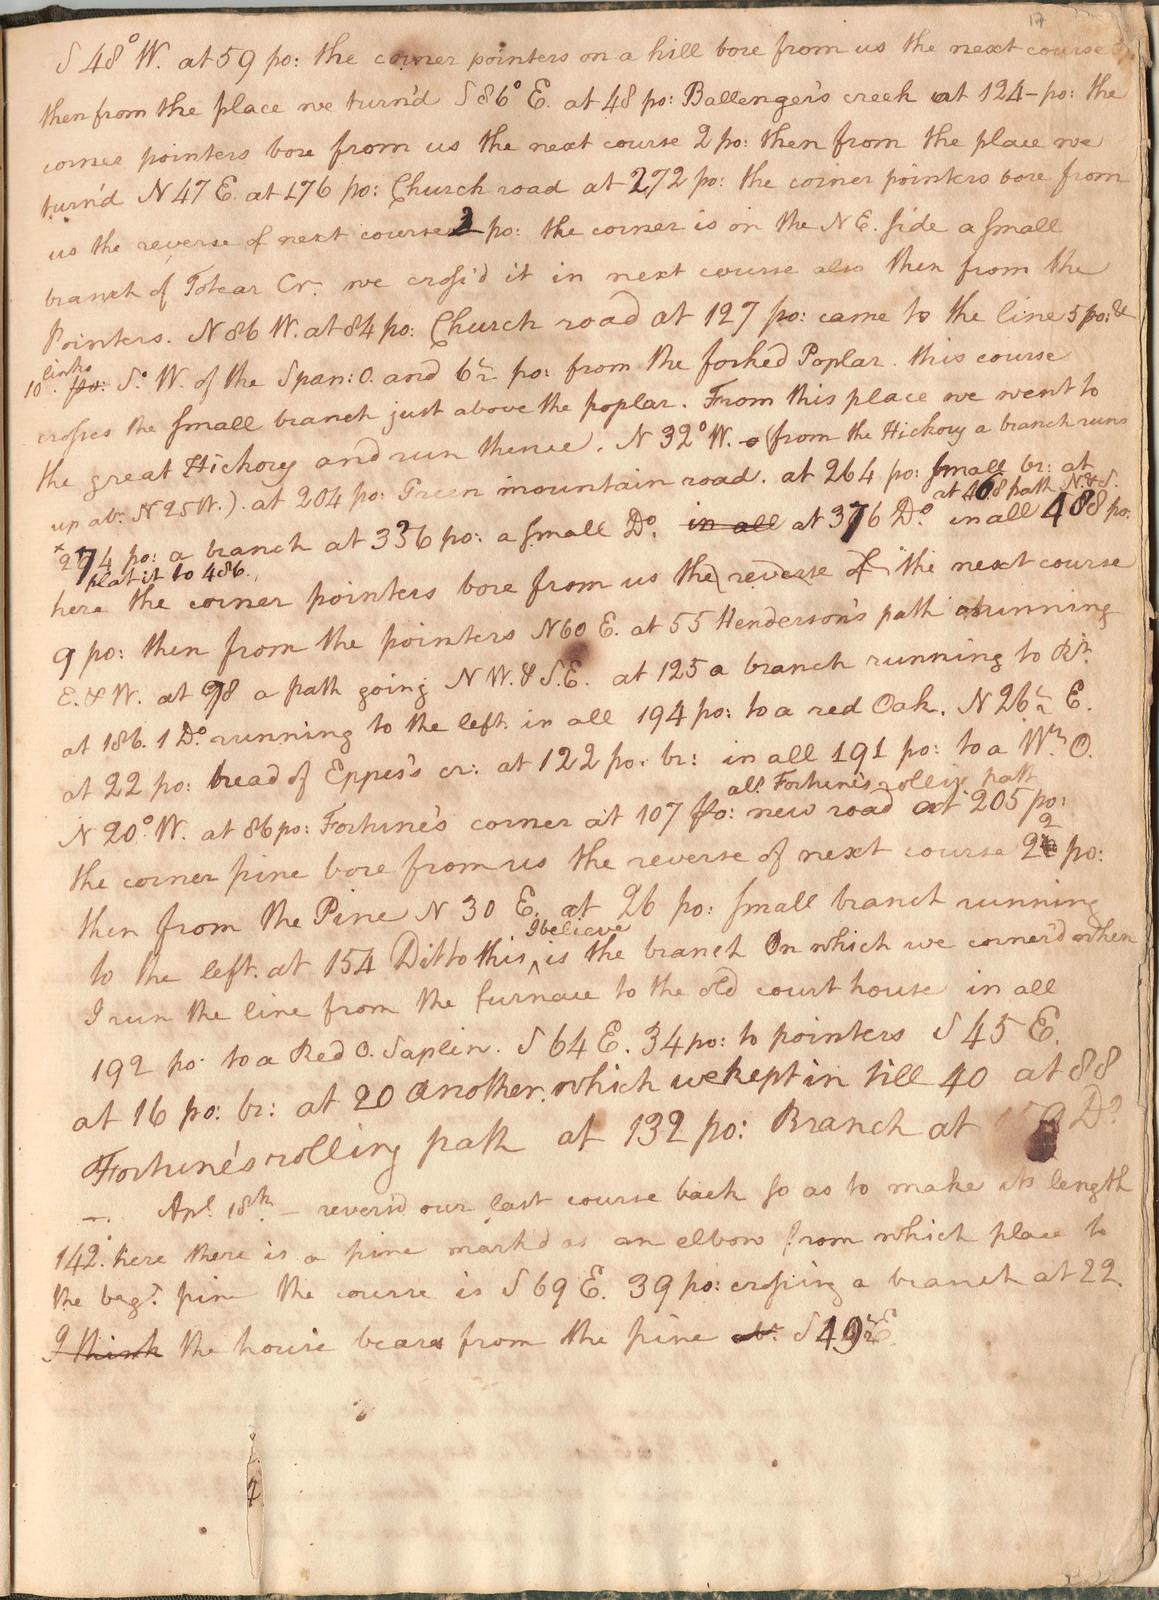 Surveyor's notes